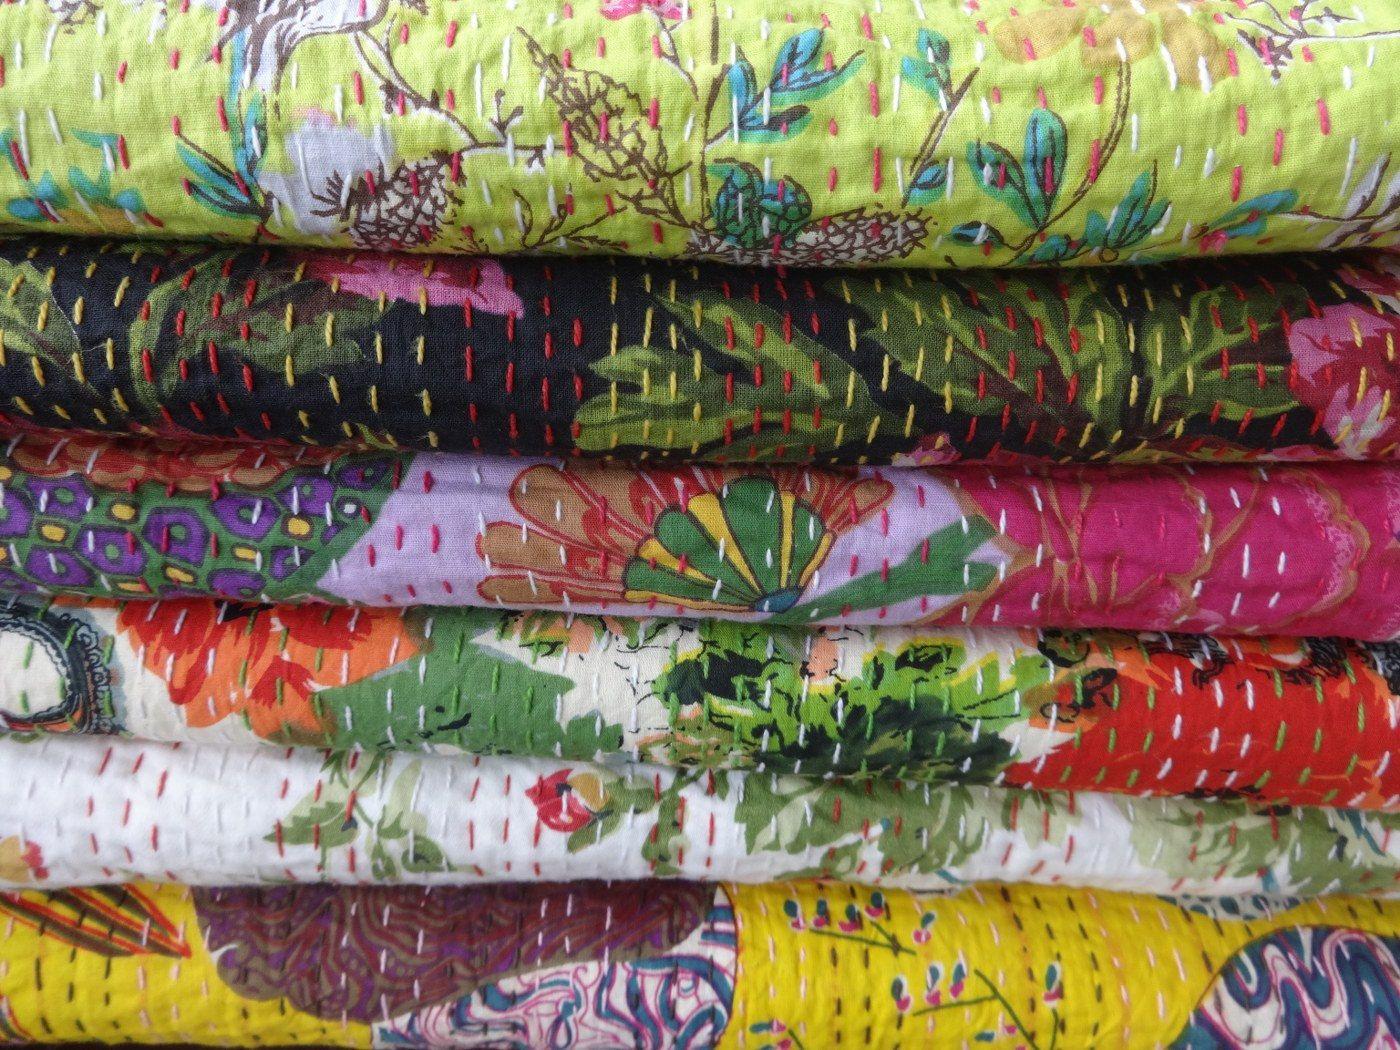 Set of 10 Queen Size Kantha Quilt, Wholesale Floral Print Kantha Bedspread,Handmade Reversible Kantha, Hand Kantha Work, Home Decor, India